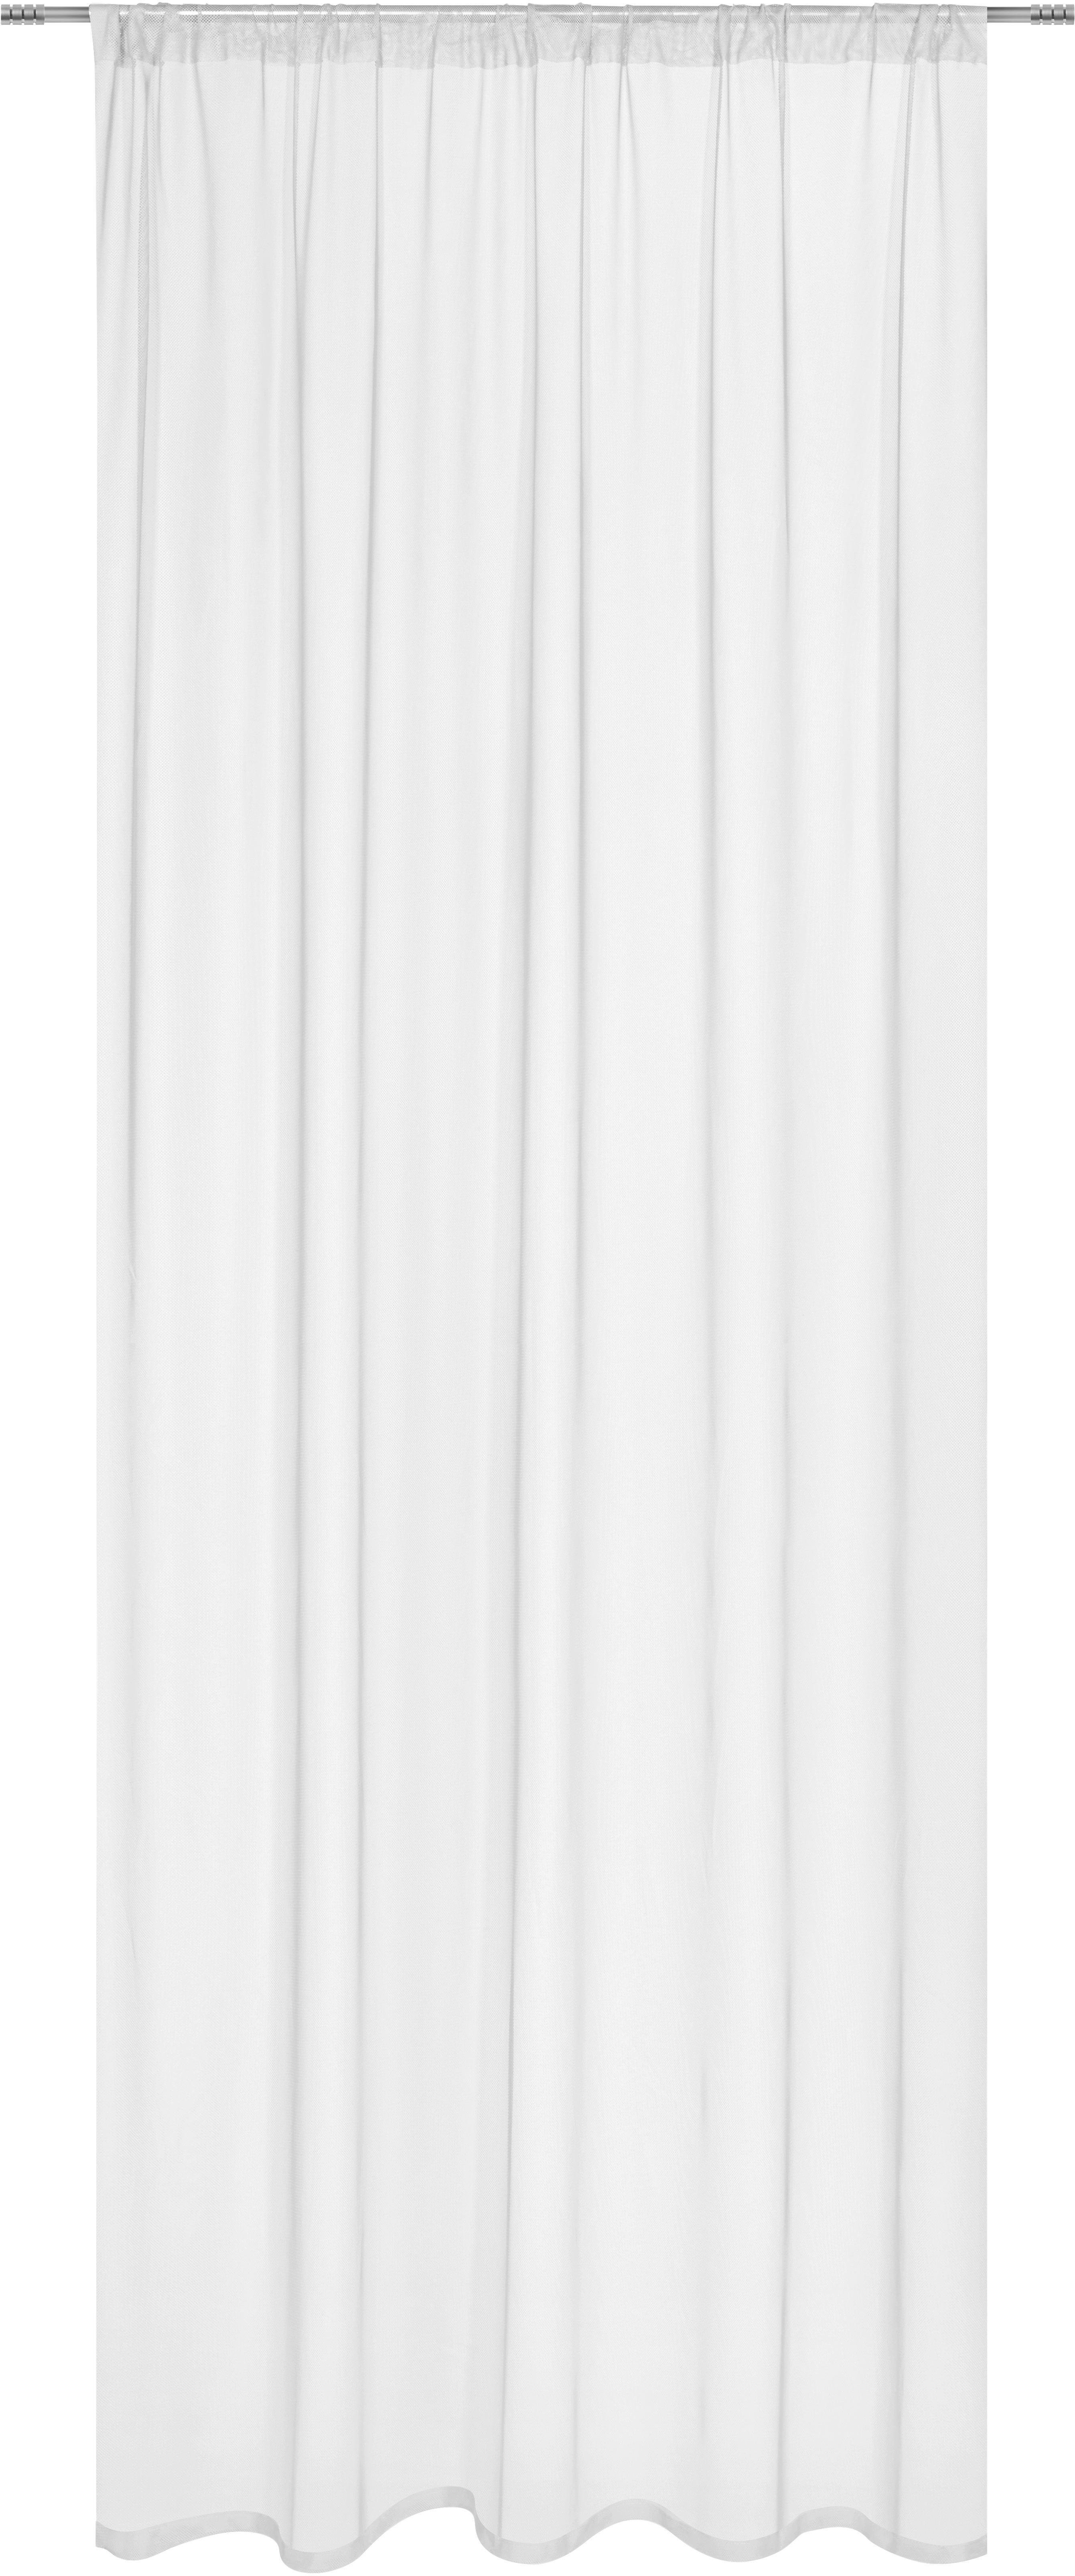 Fertigvorhang Thea in Weiß, ca. 140x245cm - Weiß, ROMANTIK / LANDHAUS, Textil (145/245cm) - MÖMAX modern living